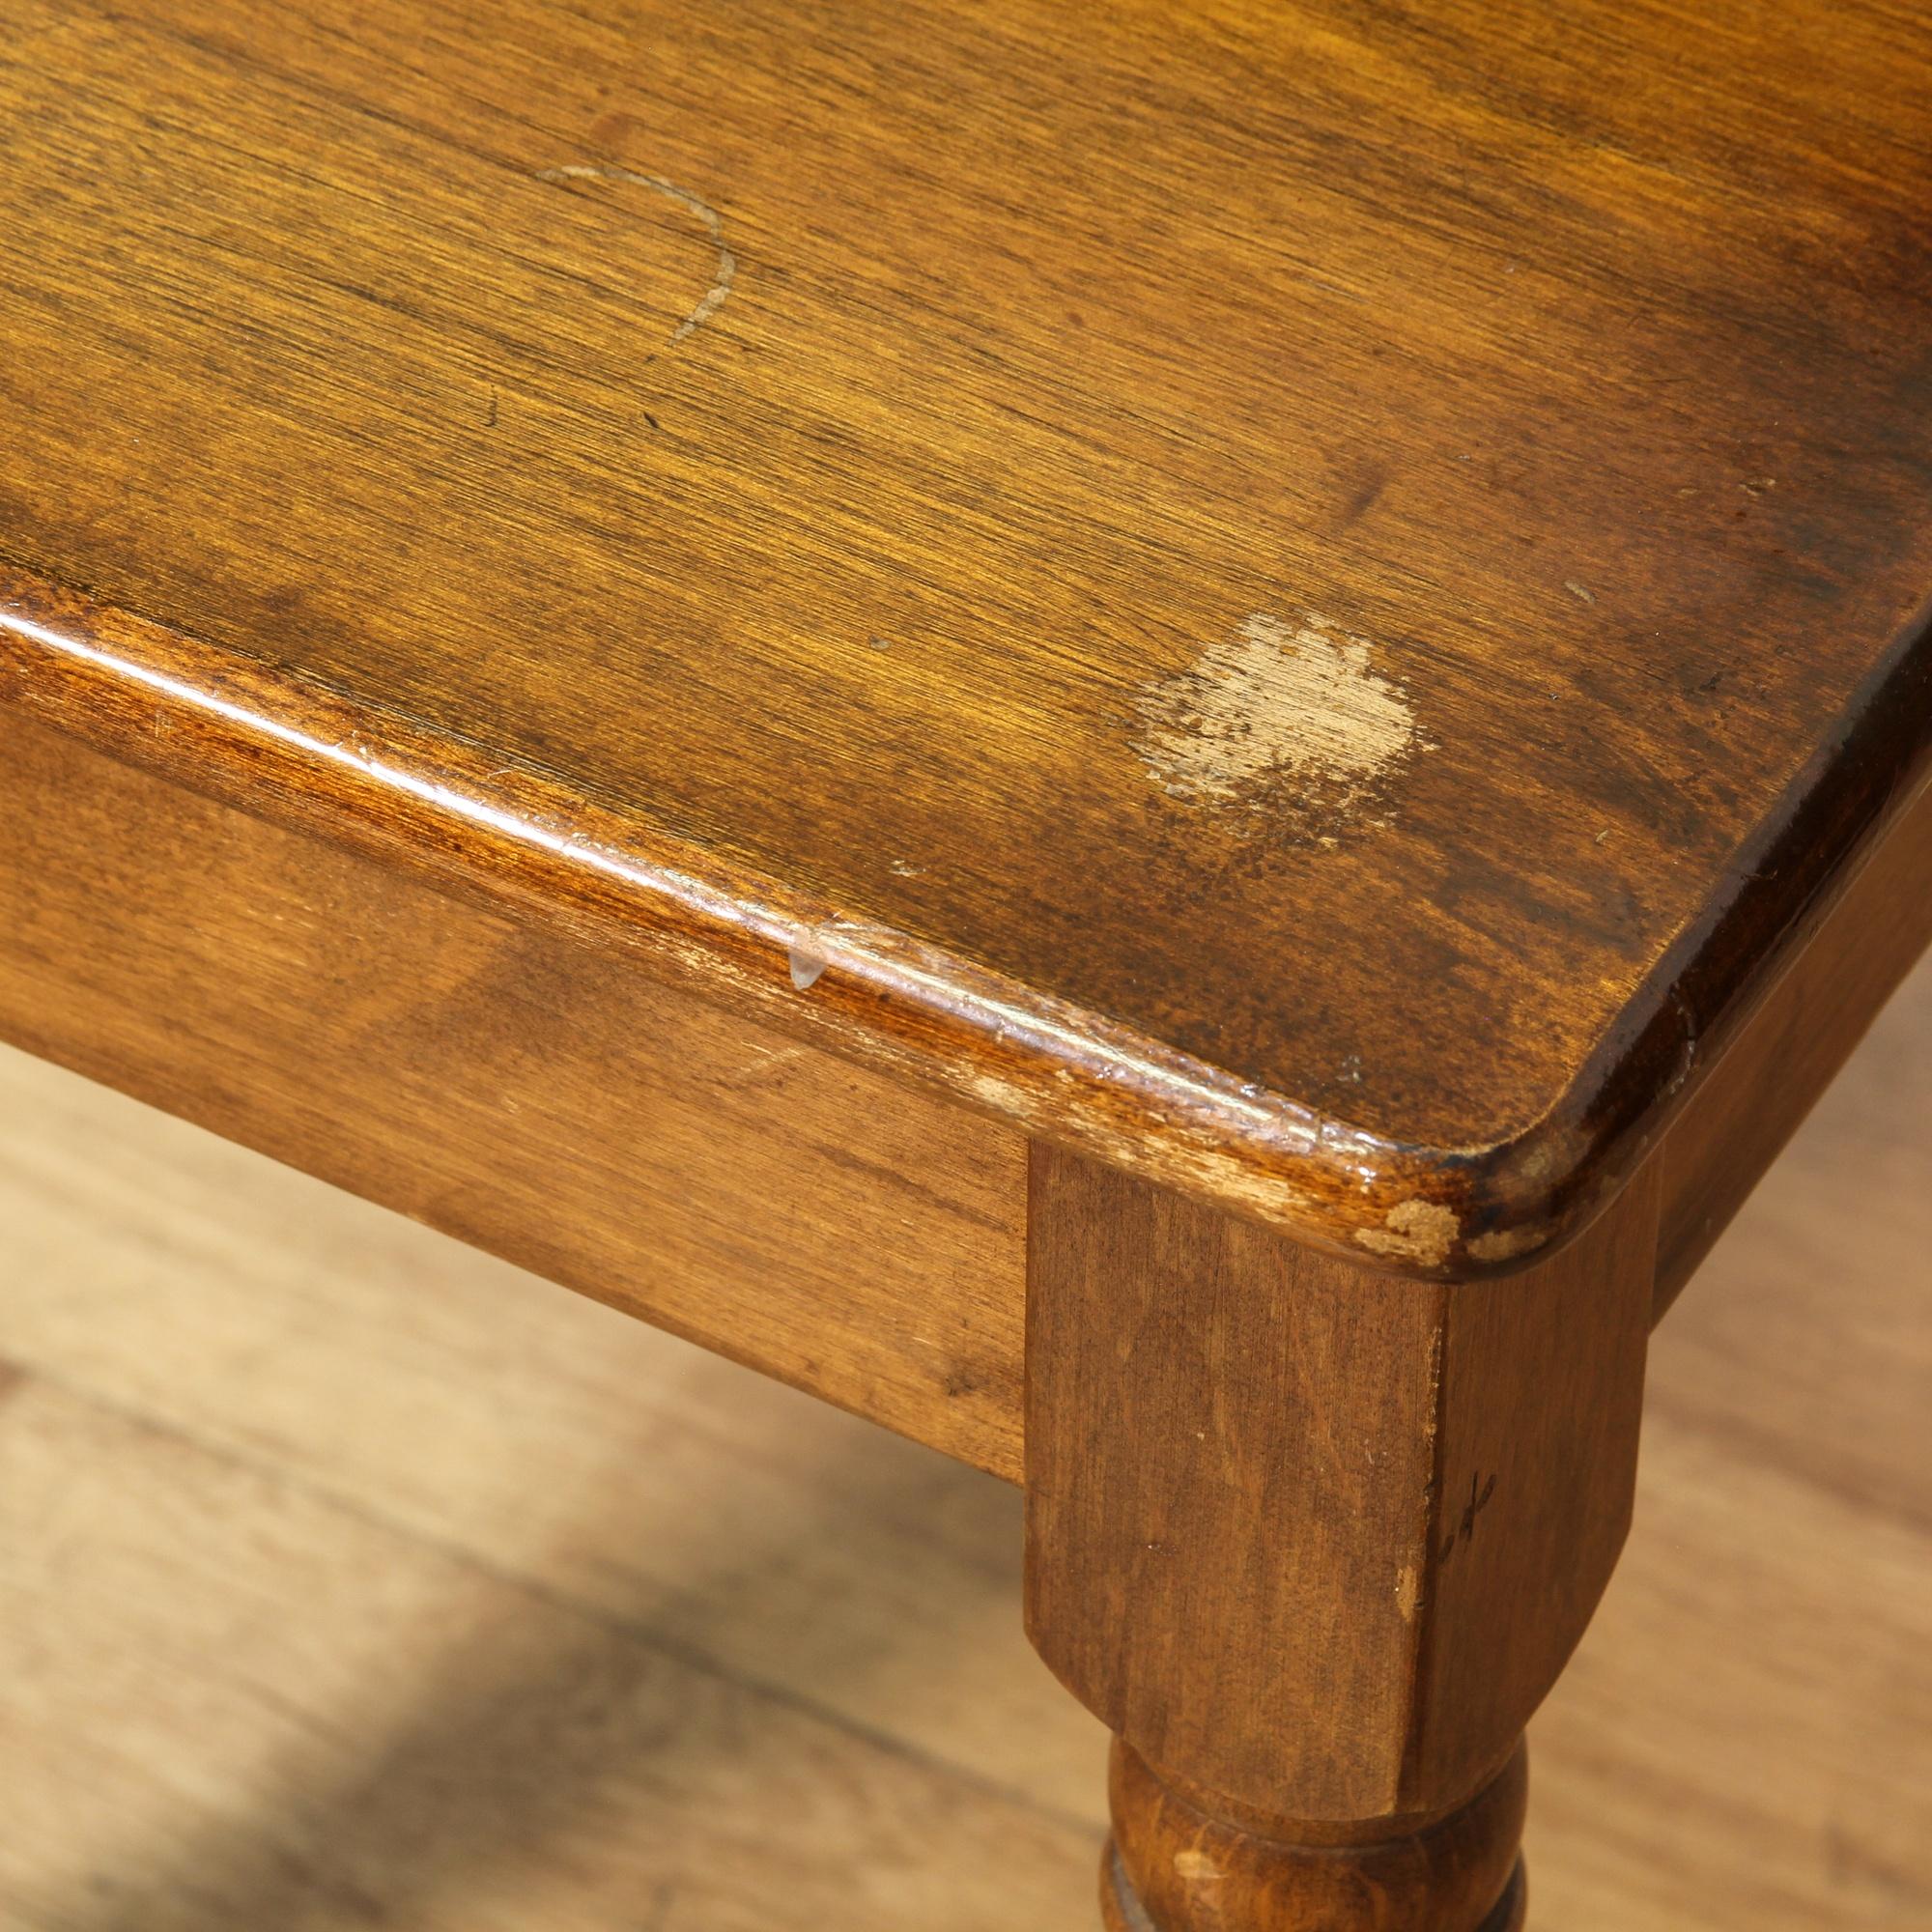 American Furniture Warehouse Desks ... Step End Tables | Loveseat Vintage Furniture San Diego & Los Angeles